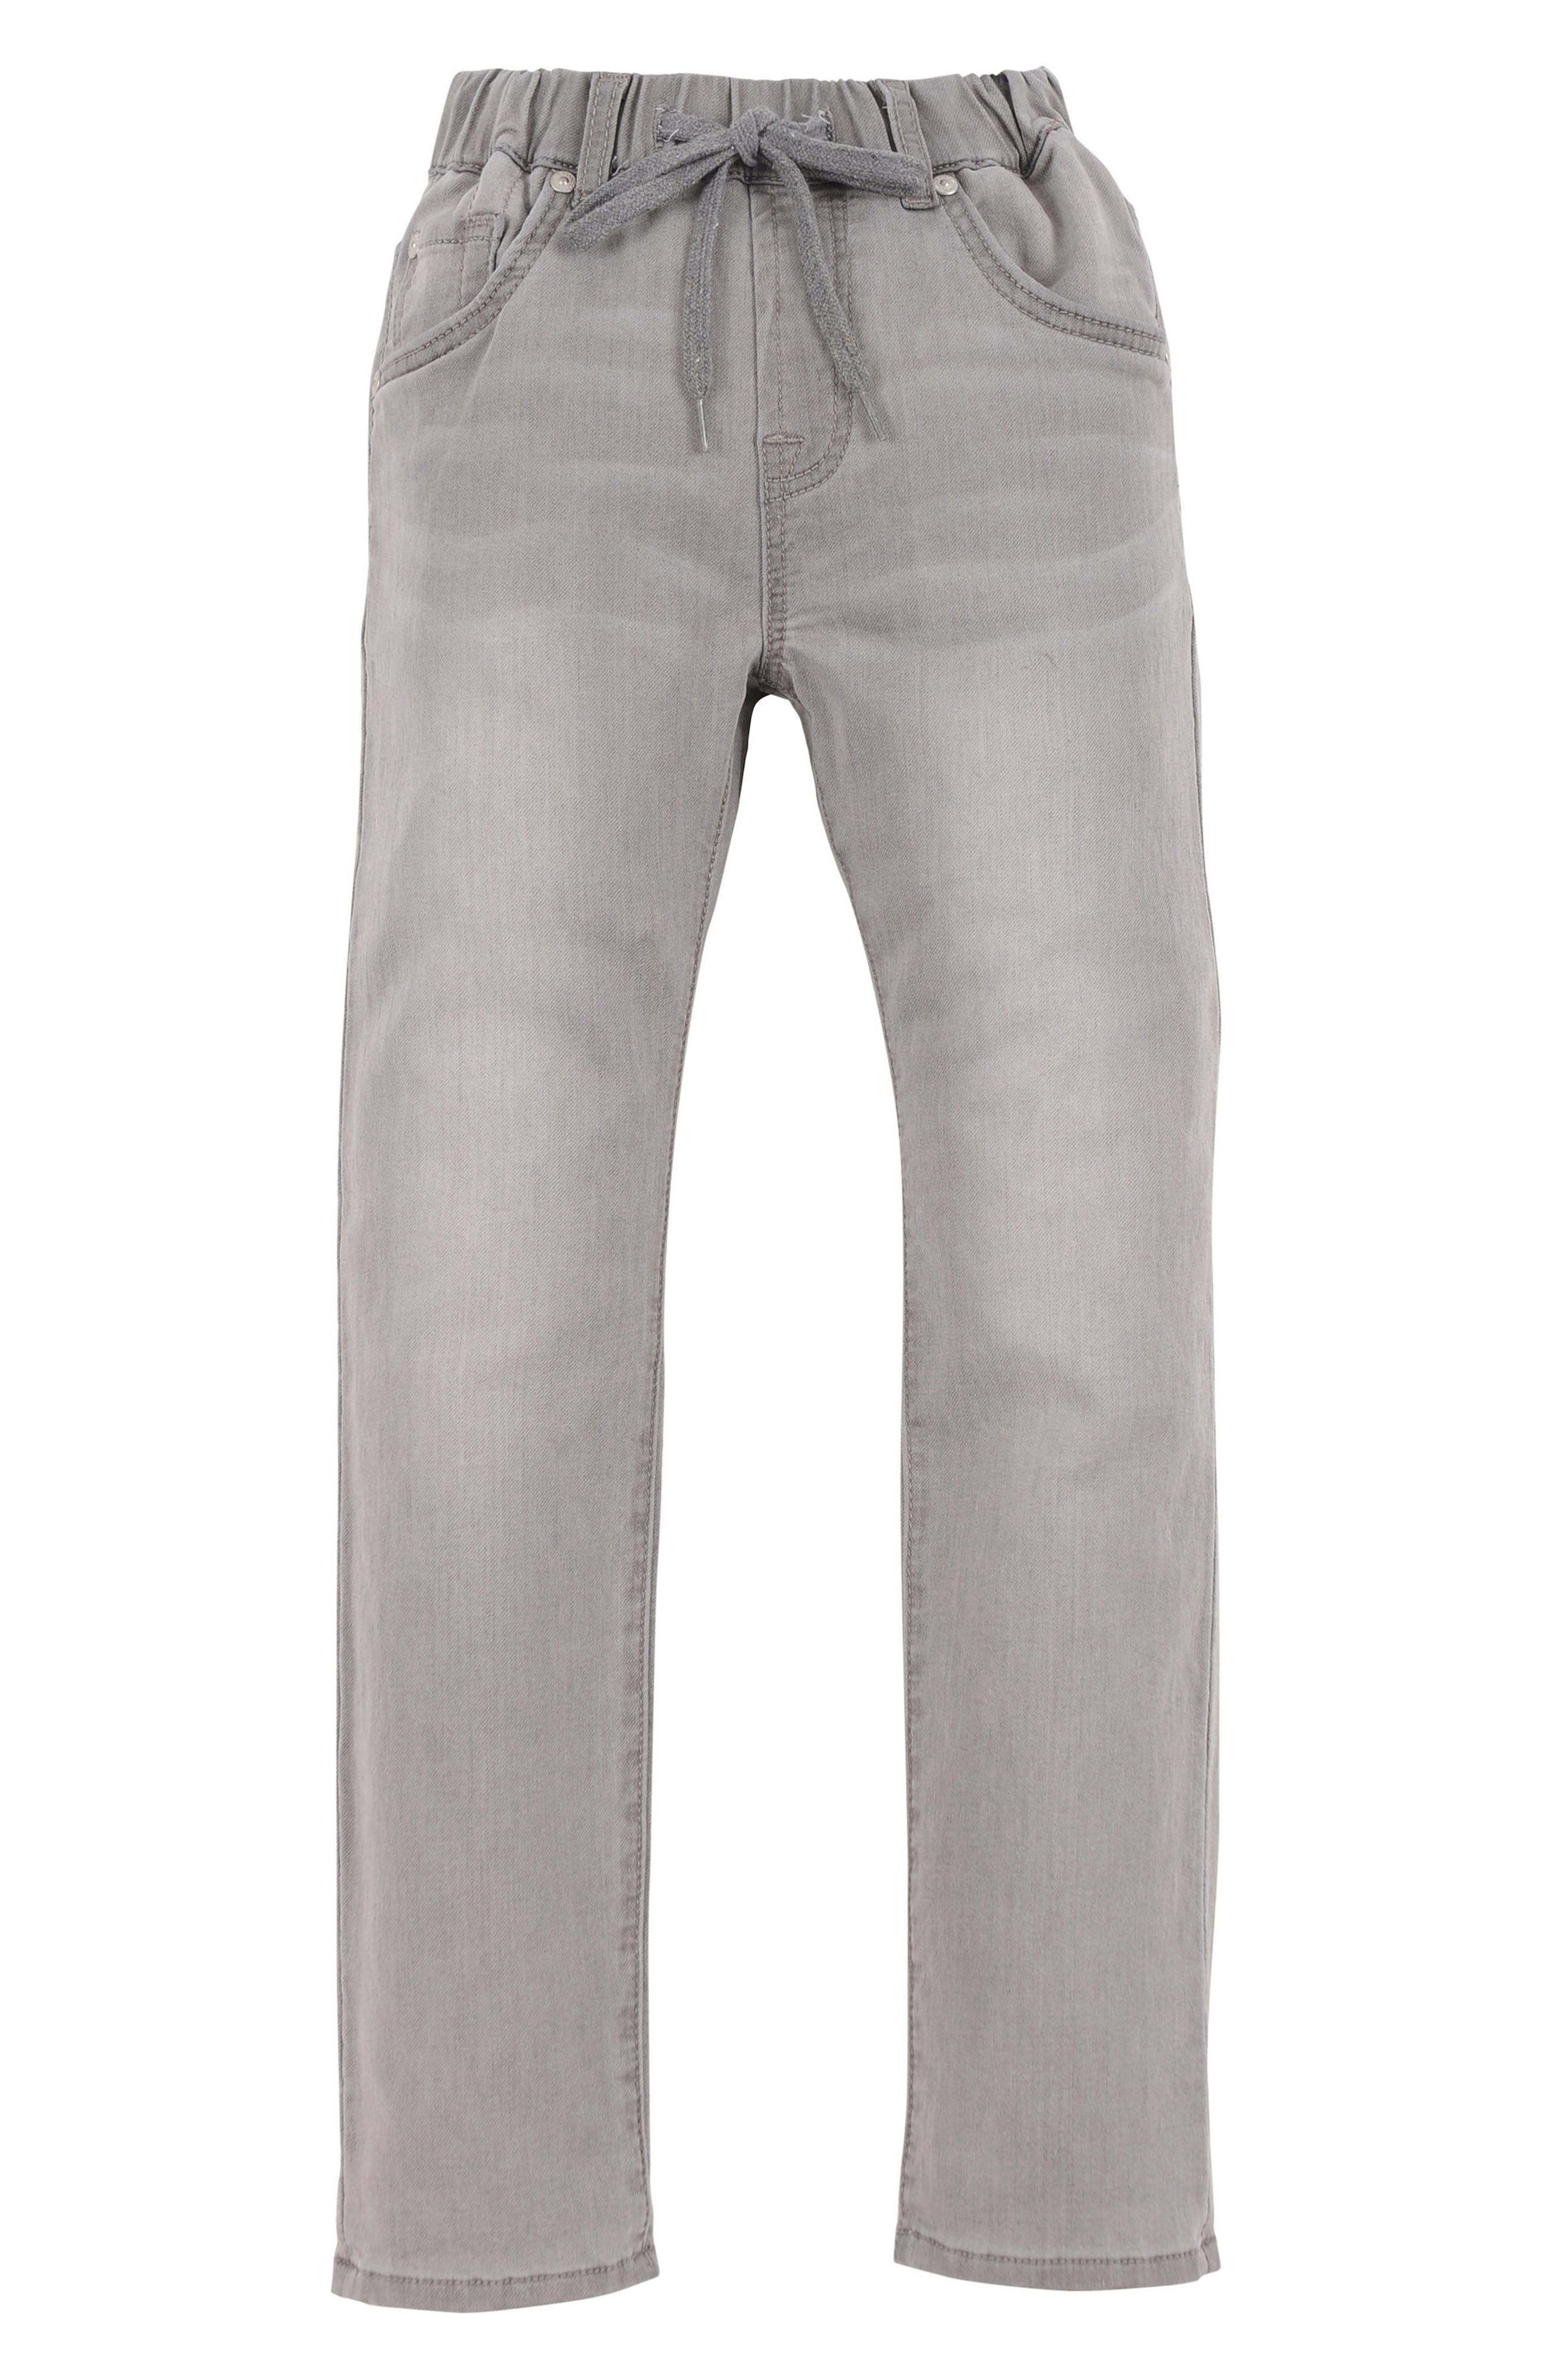 Jogger Jeans,                         Main,                         color, 036